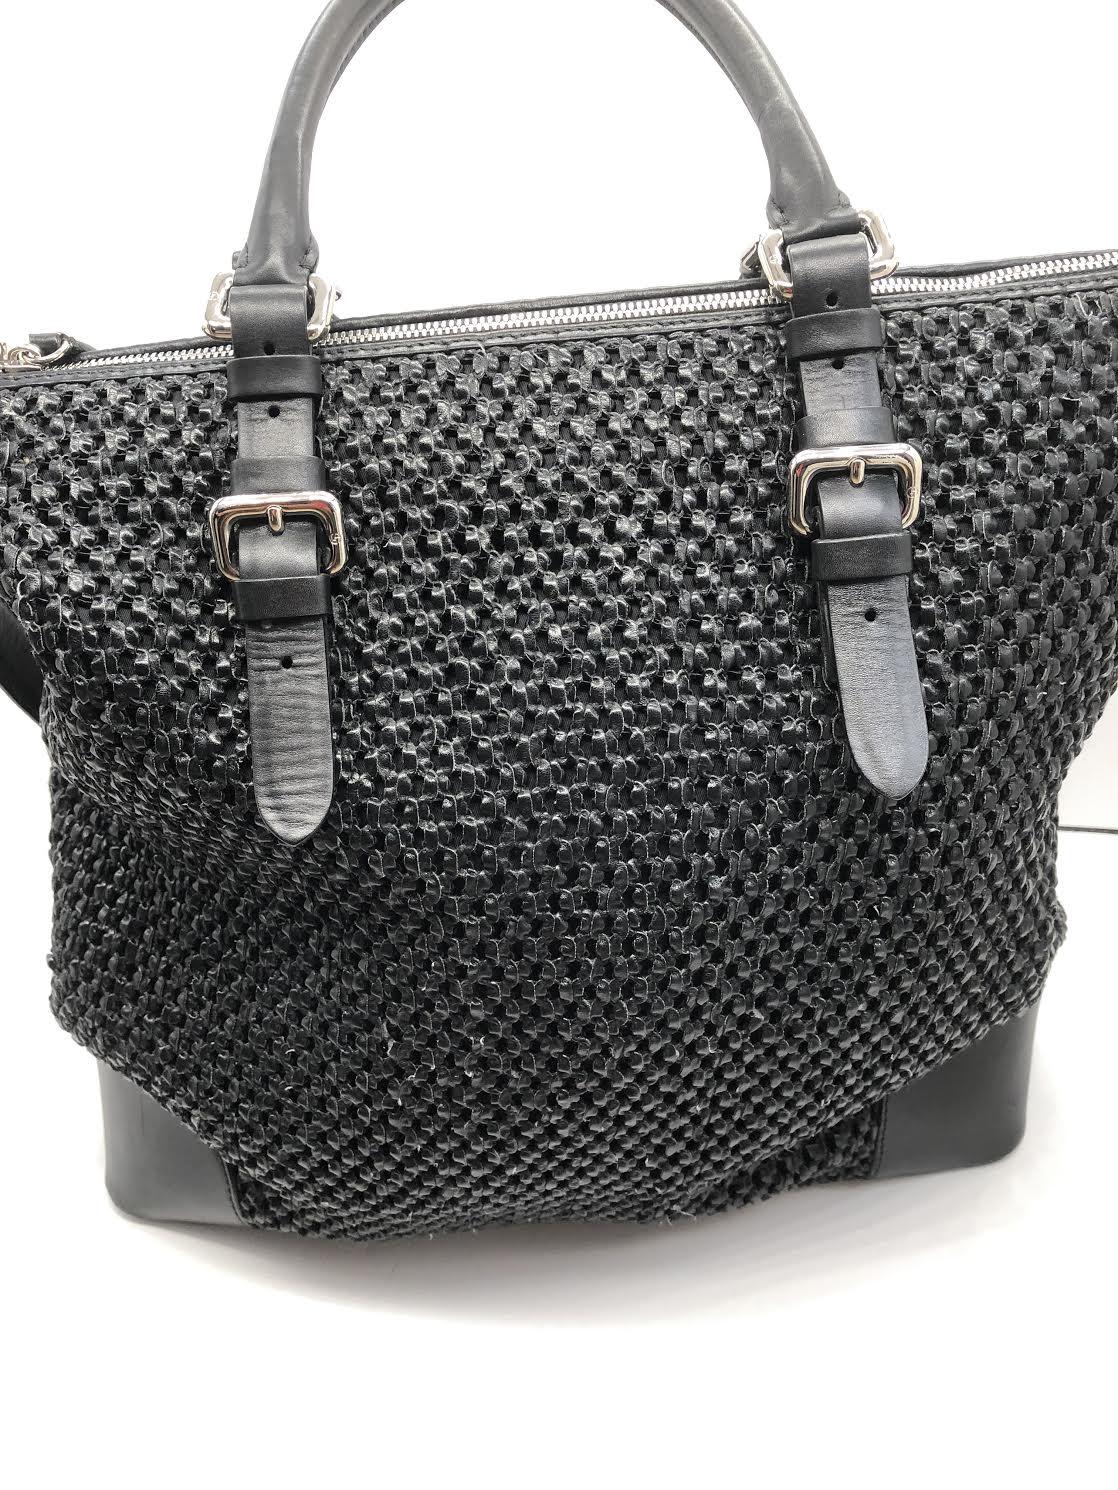 c92fb854c192 Giorgio Armani Handbag Women s Black leather MSRP  1